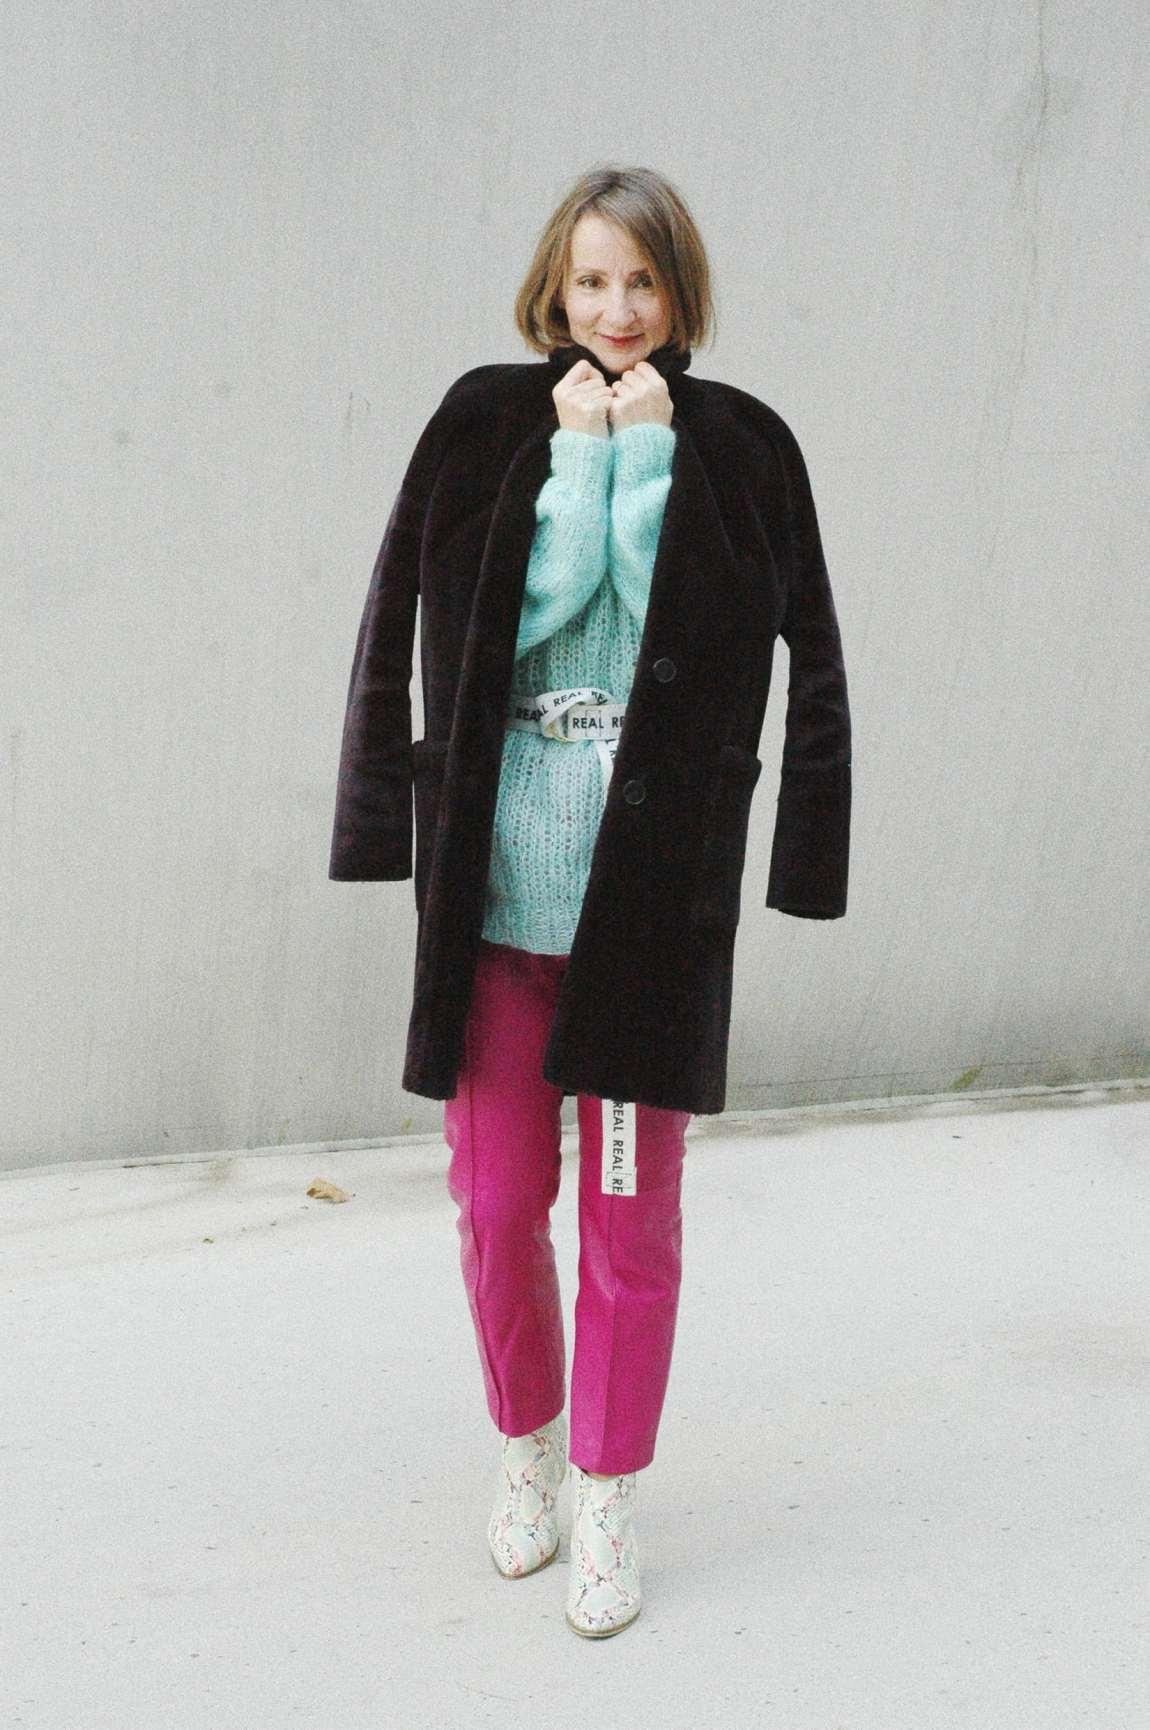 Ankle_boots-Mode_blog-oceanblue-style.jpg